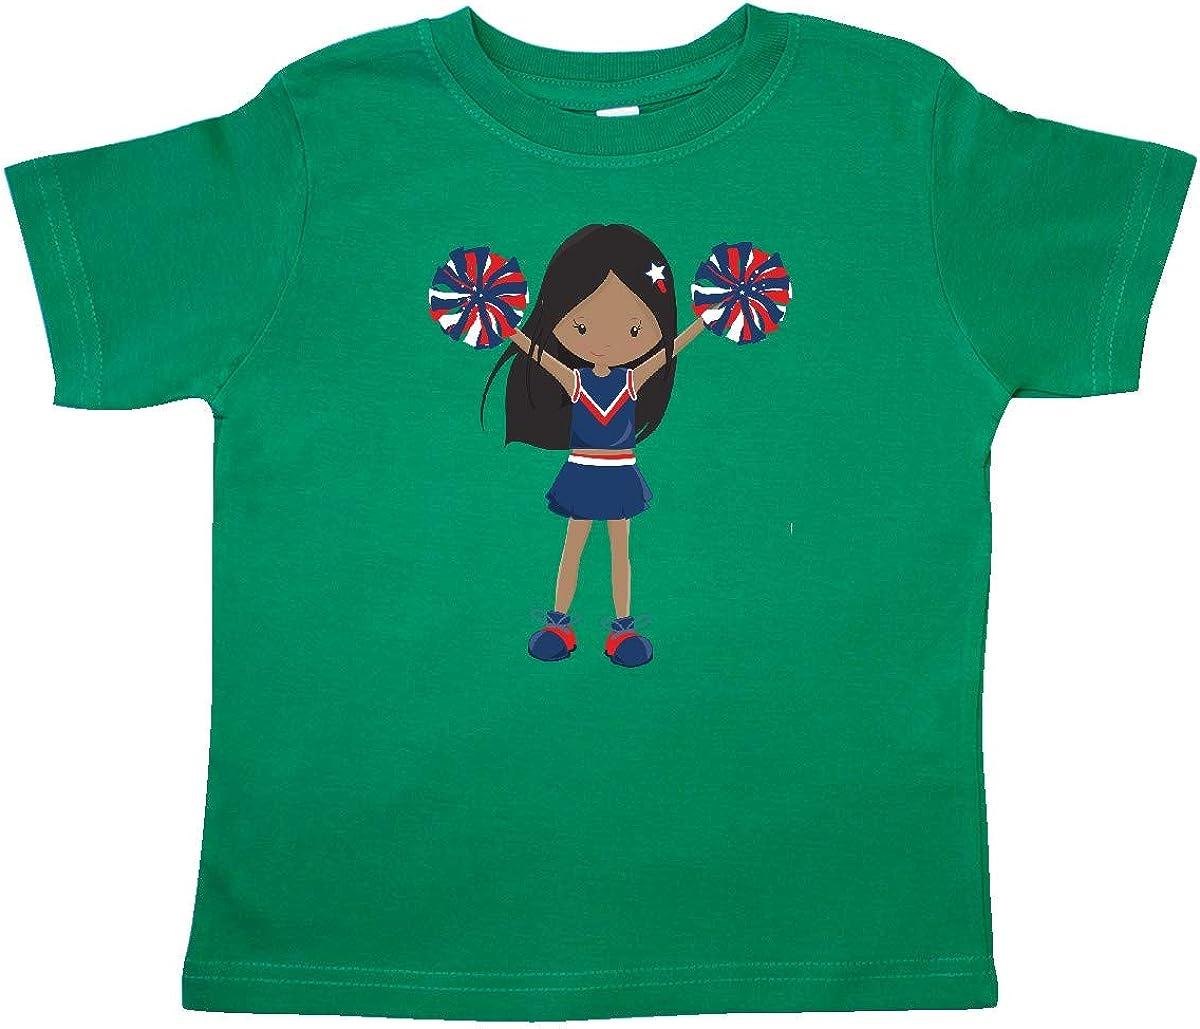 Cheerleaders Blue Uniform Toddler T-Shirt inktastic African American Girl